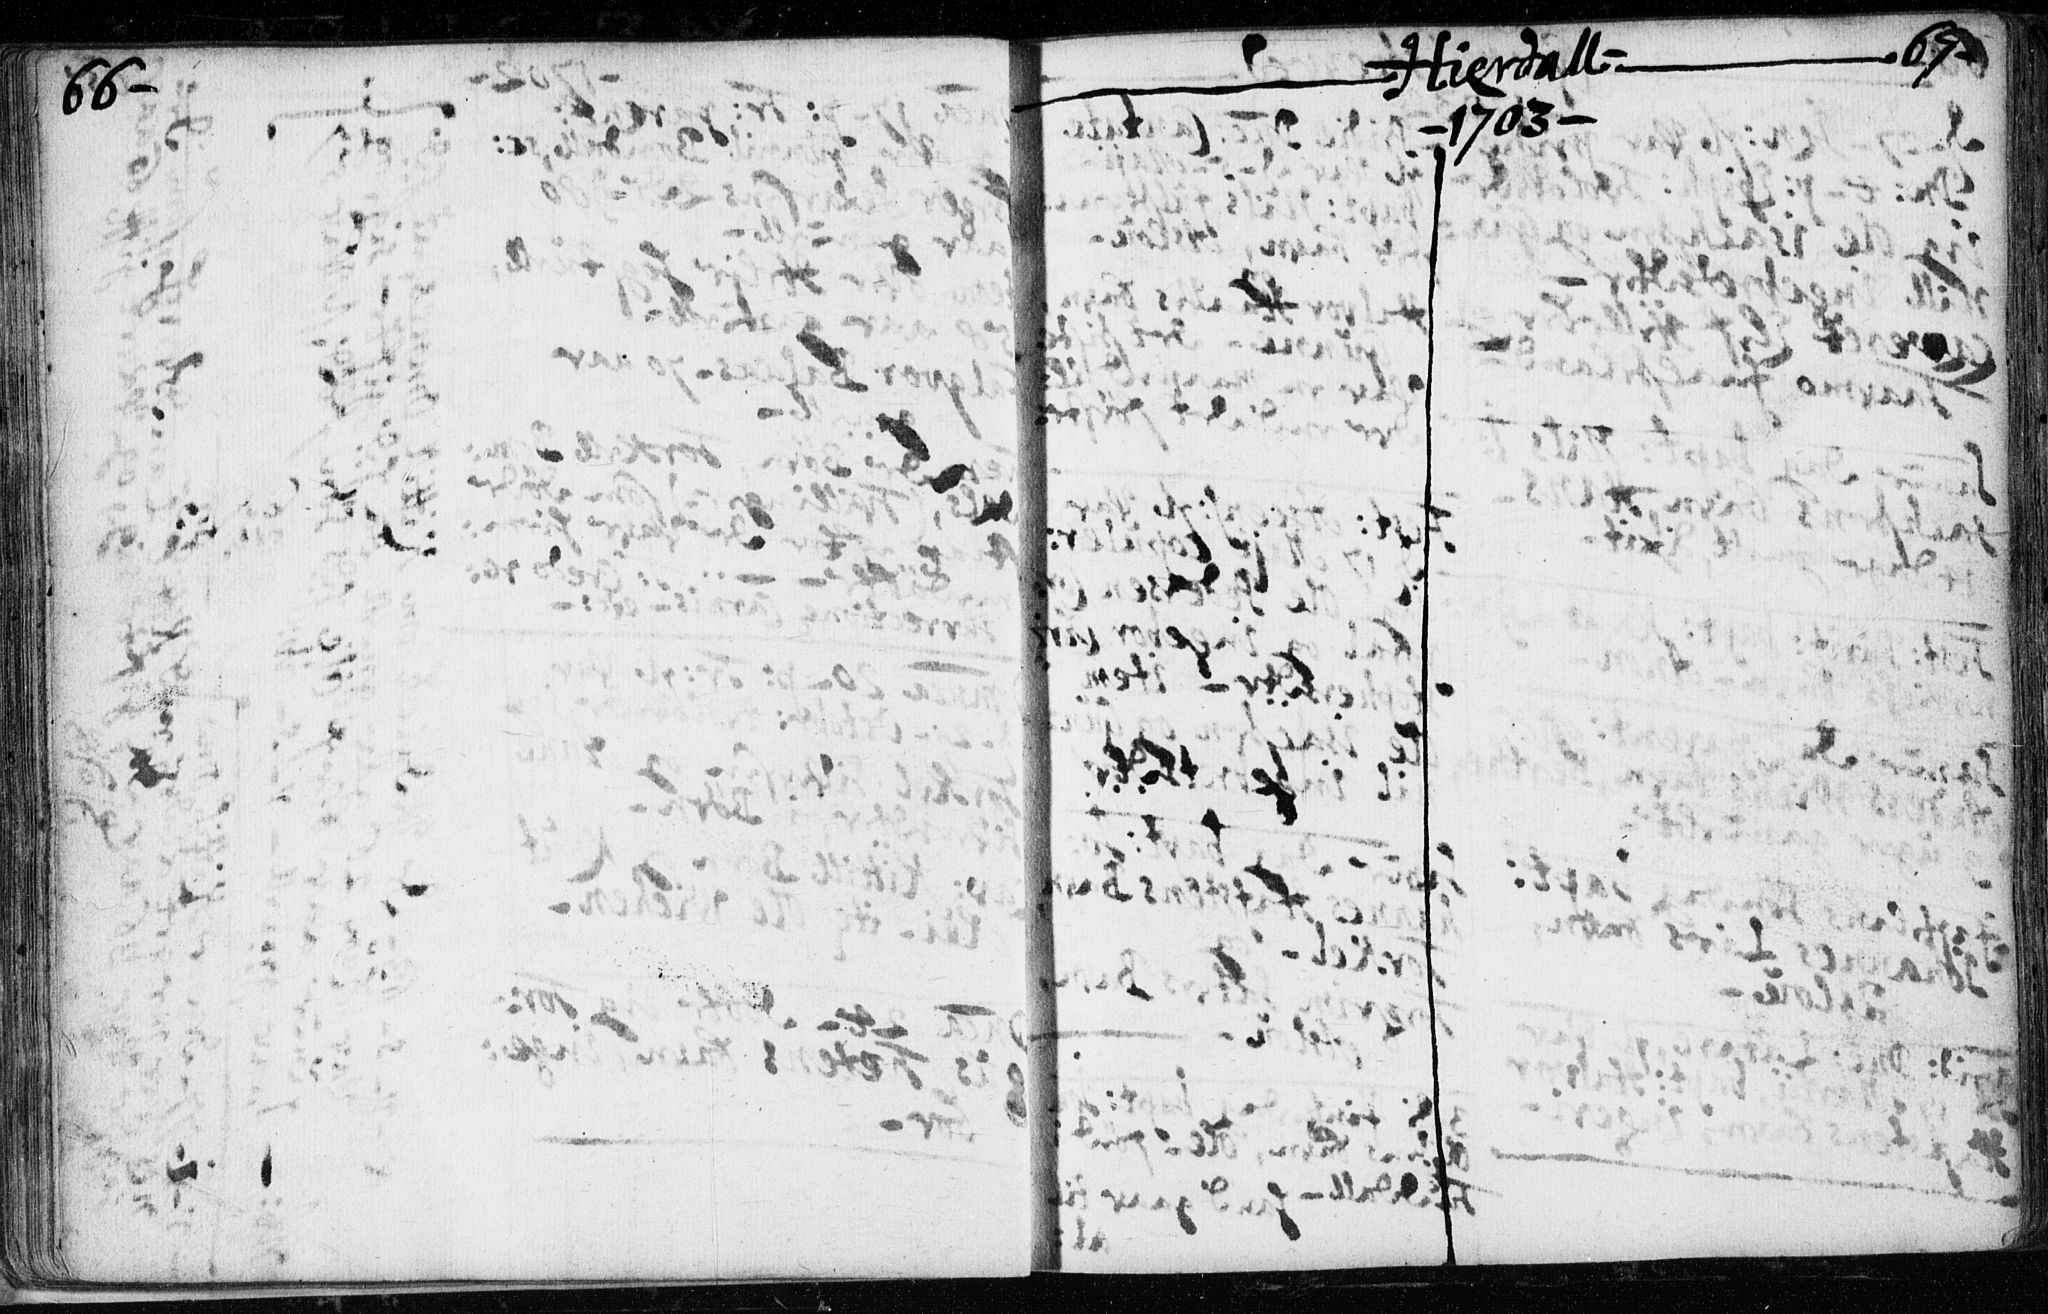 SAKO, Hjartdal kirkebøker, F/Fa/L0001: Ministerialbok nr. I 1, 1685-1714, s. 66-67